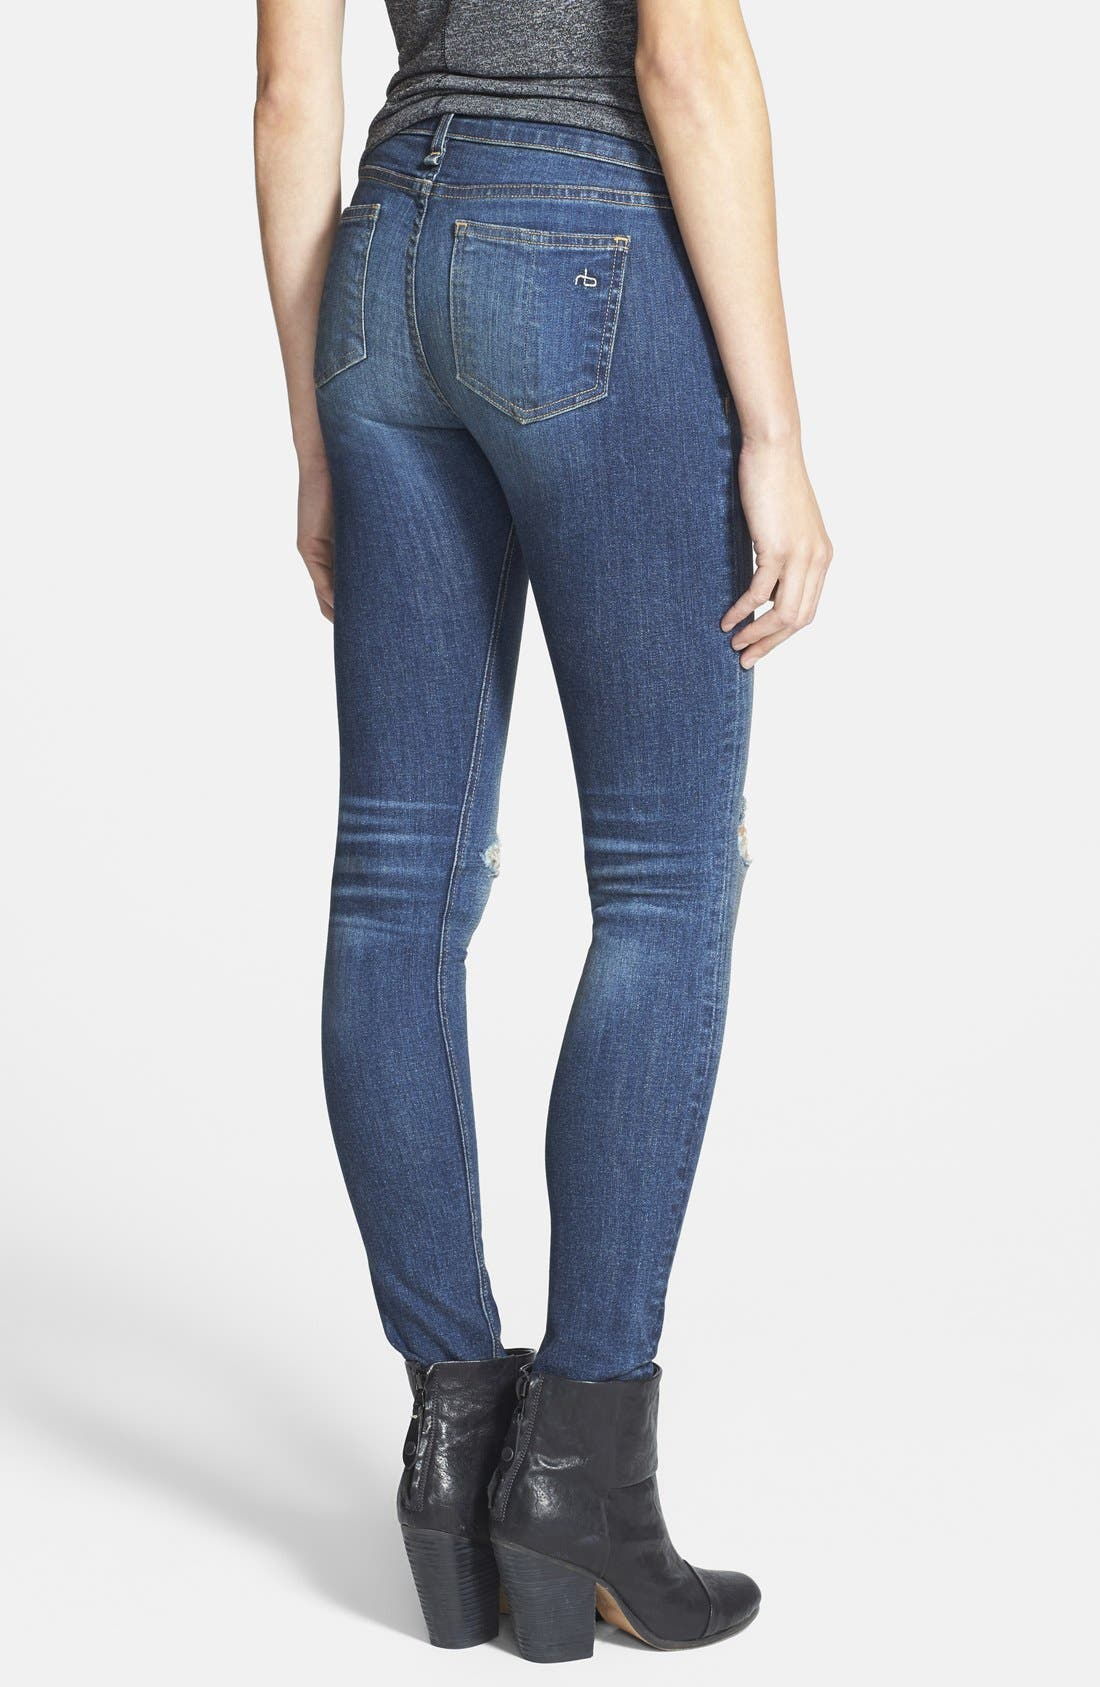 Alternate Image 2  - rag & bone/JEAN 'The Skinny' Stretch Jeans (Pacifico)